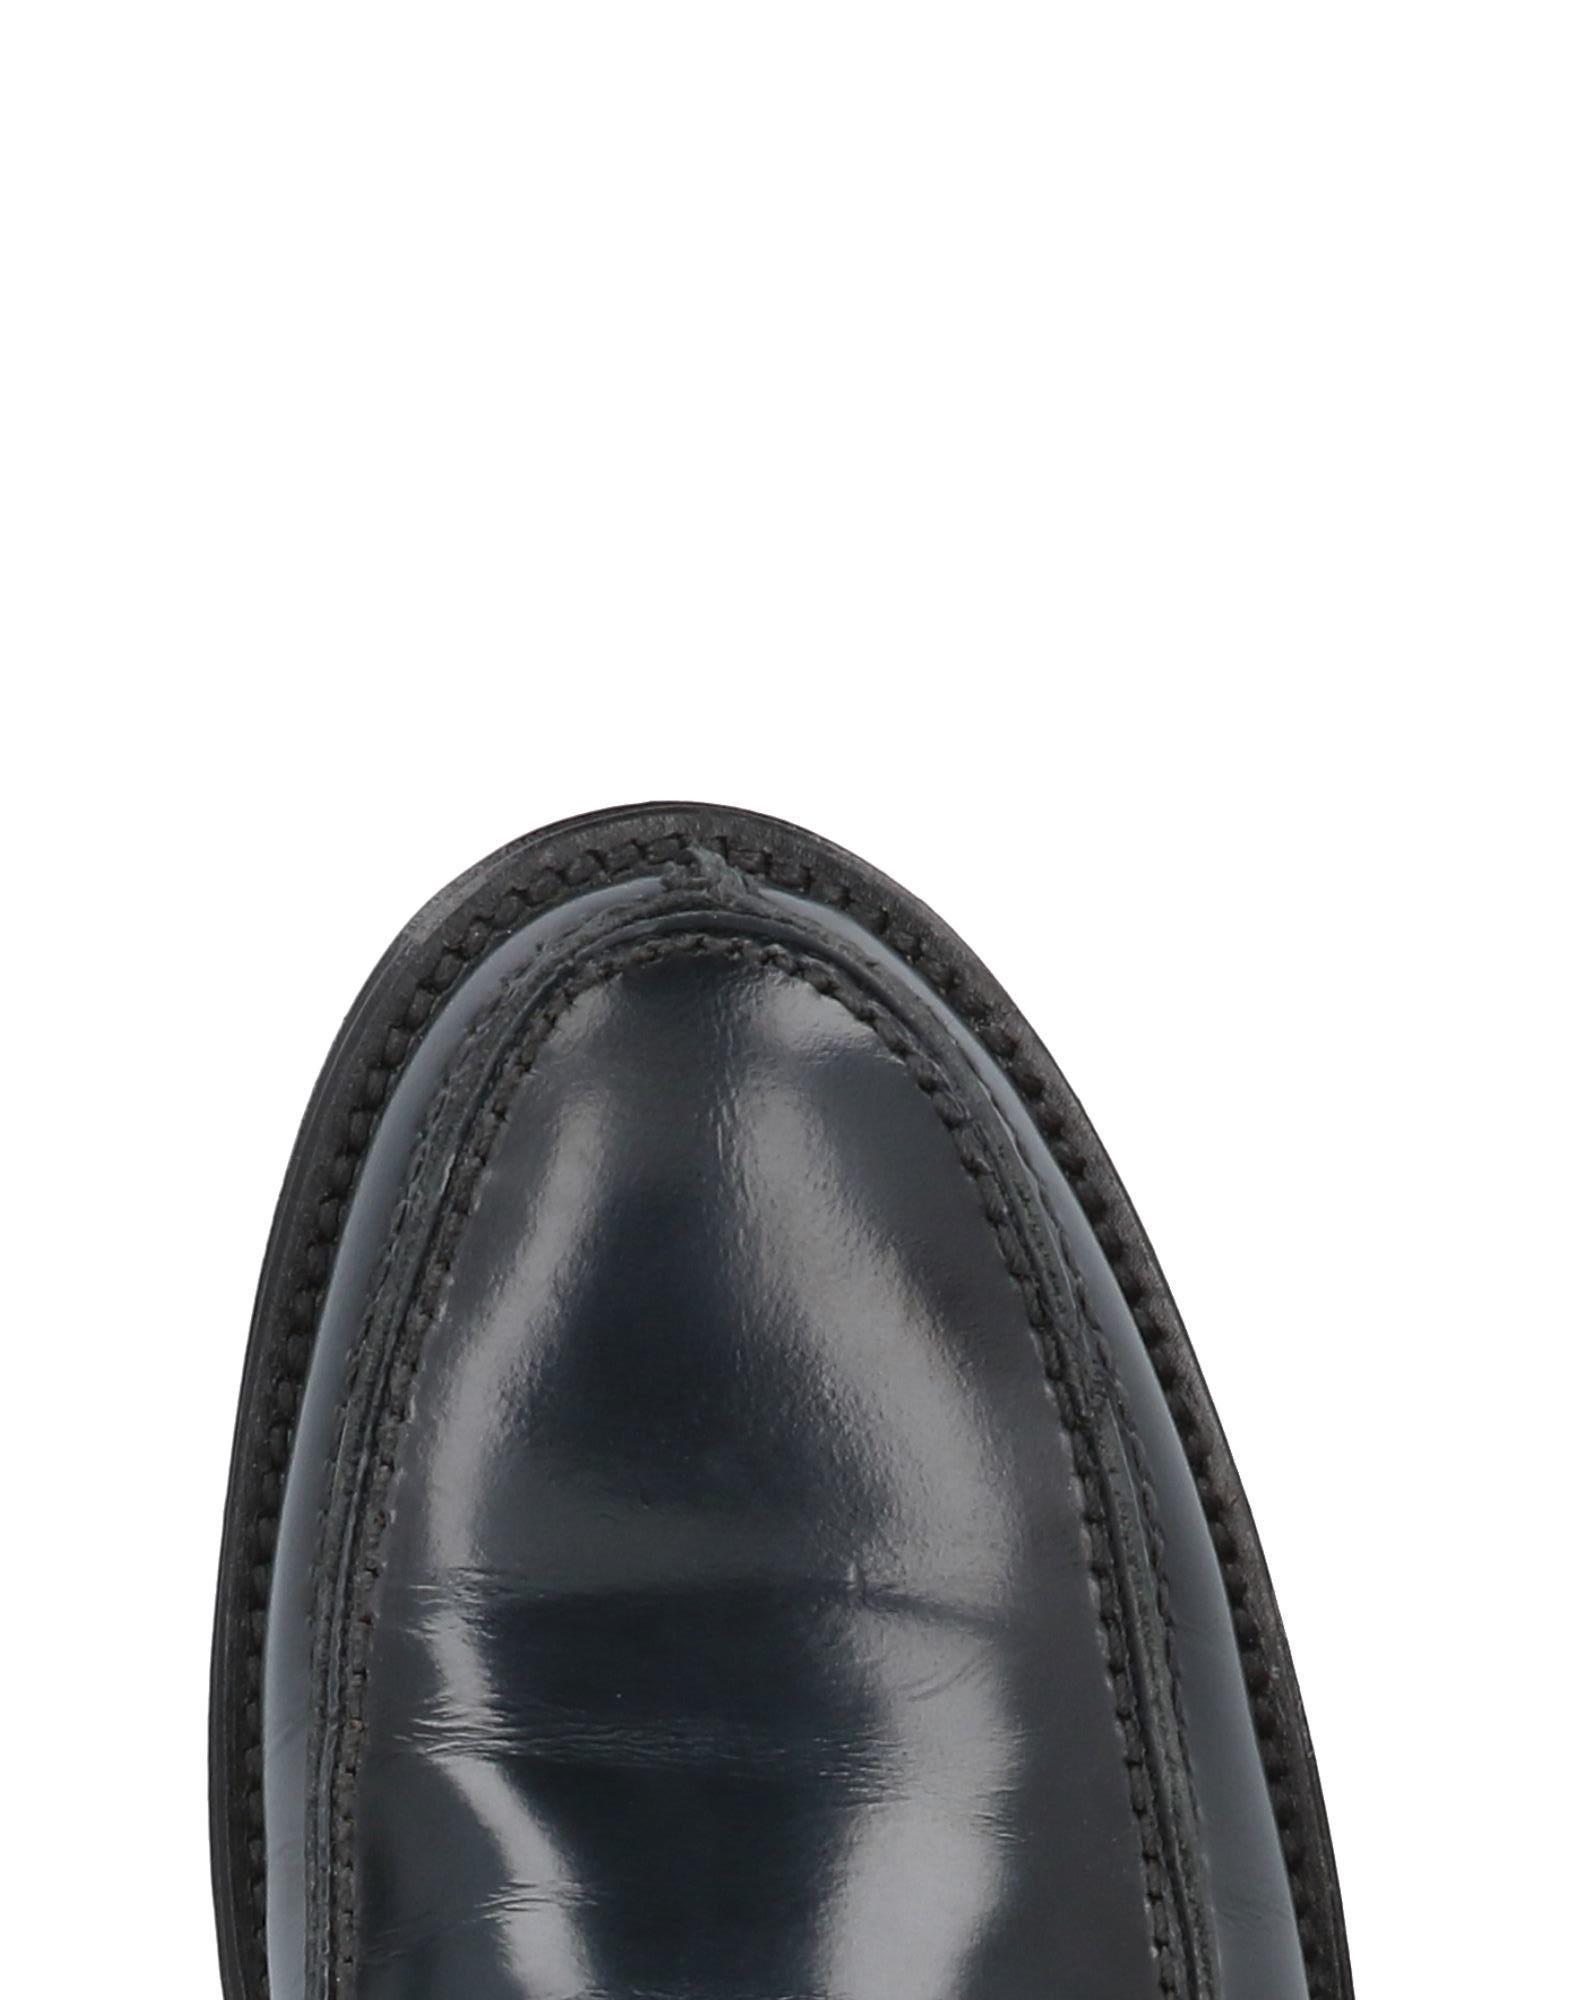 Bruno Verri Leather Loafer in Dark Blue (Blue) for Men